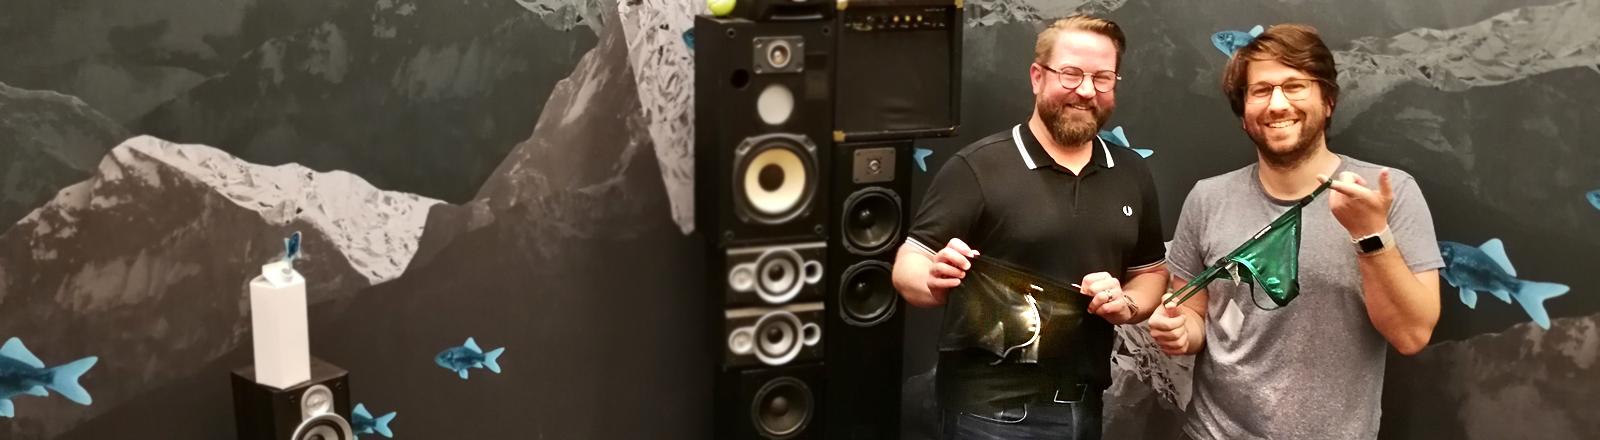 Moderator Sebastian Sonntag und Trikotagen-Fachverkäufer Michael Leder präsentieren Unterhosen